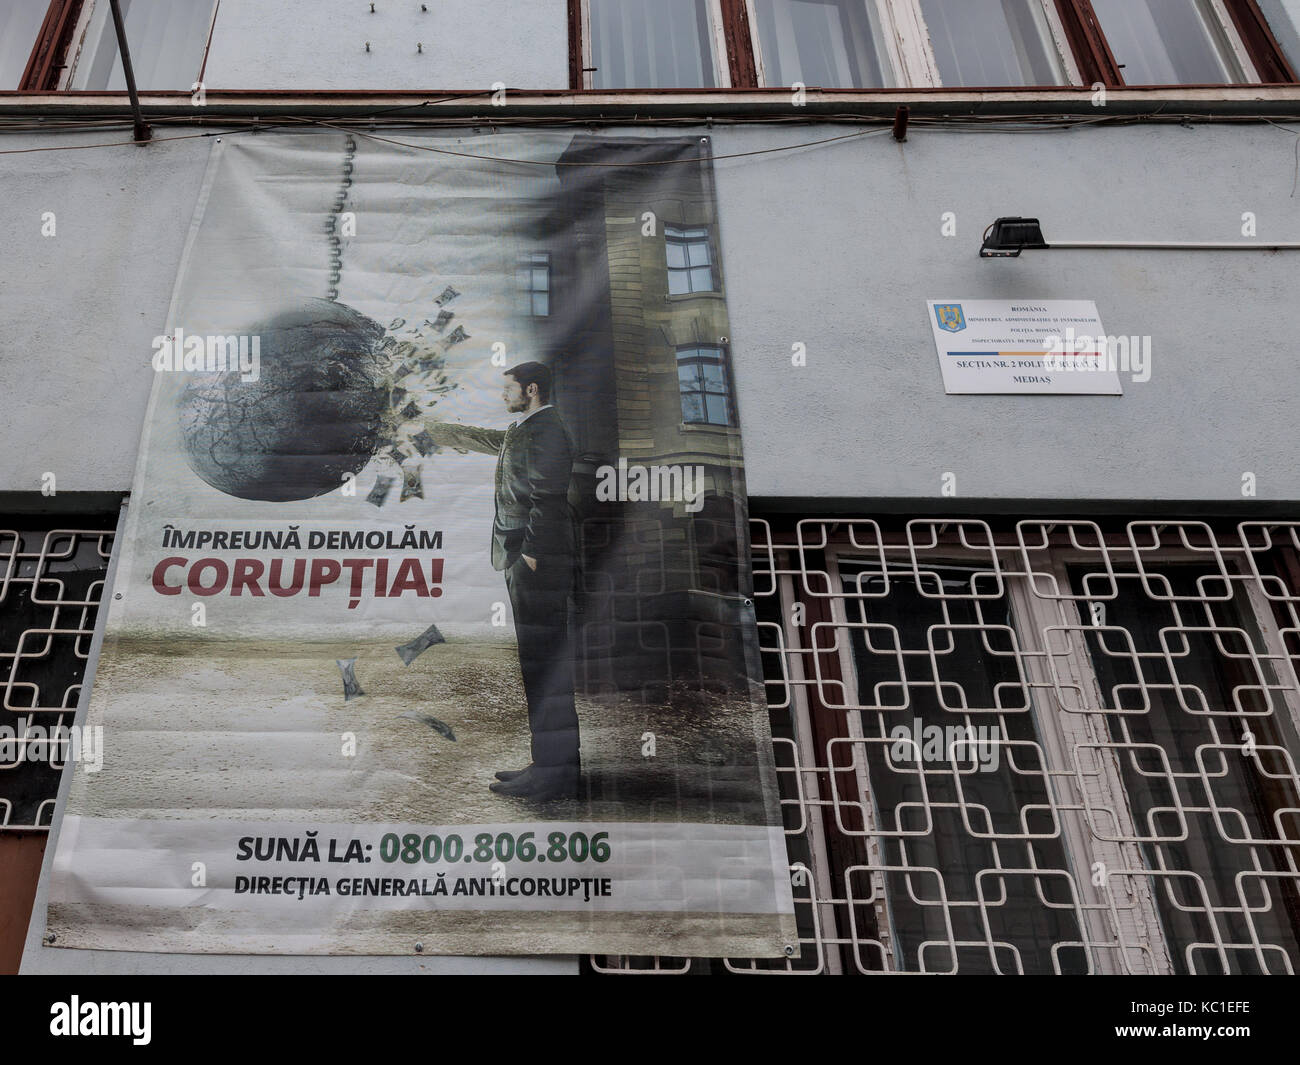 MEDIAS, ROMANIA - SEPTEMBER 22, 2017: Anti Corruption poster displayed on a police station wall in Medias, Transylvania. - Stock Image